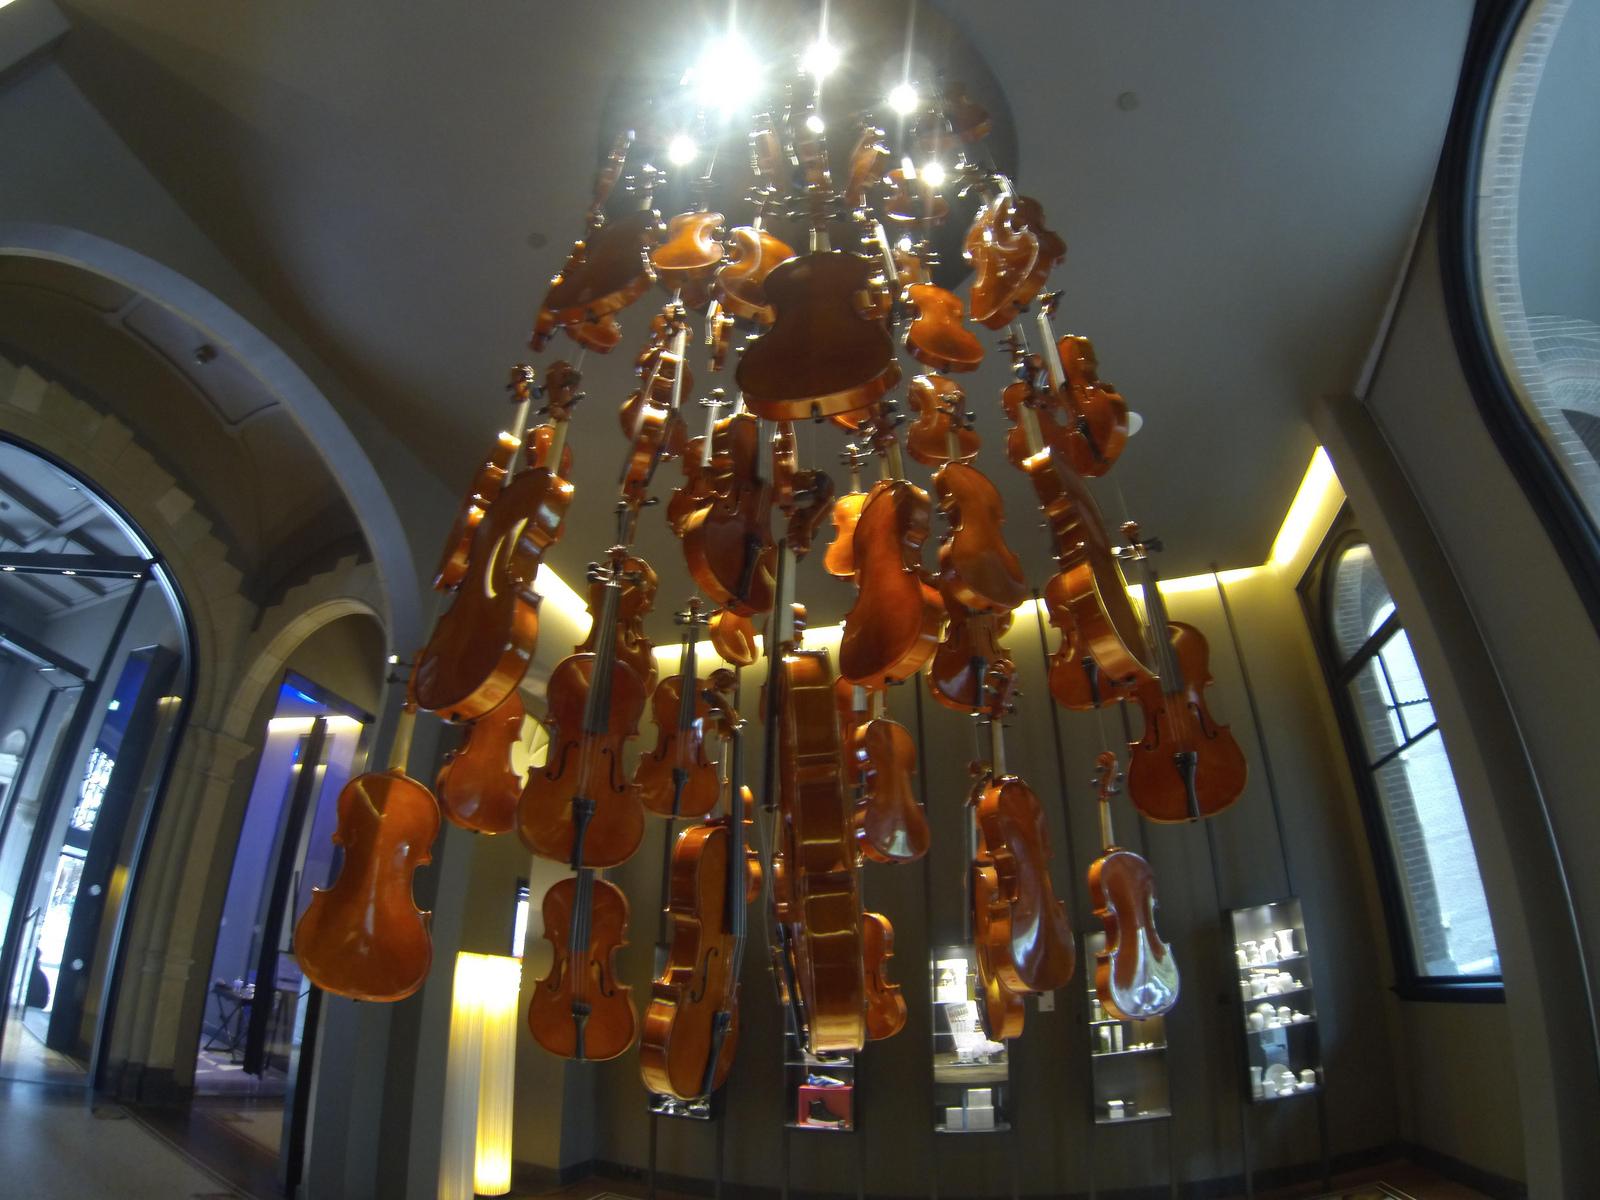 conservatorium-hotel-amsterdam-violin-chandelier-reception-table-peonies.jpg